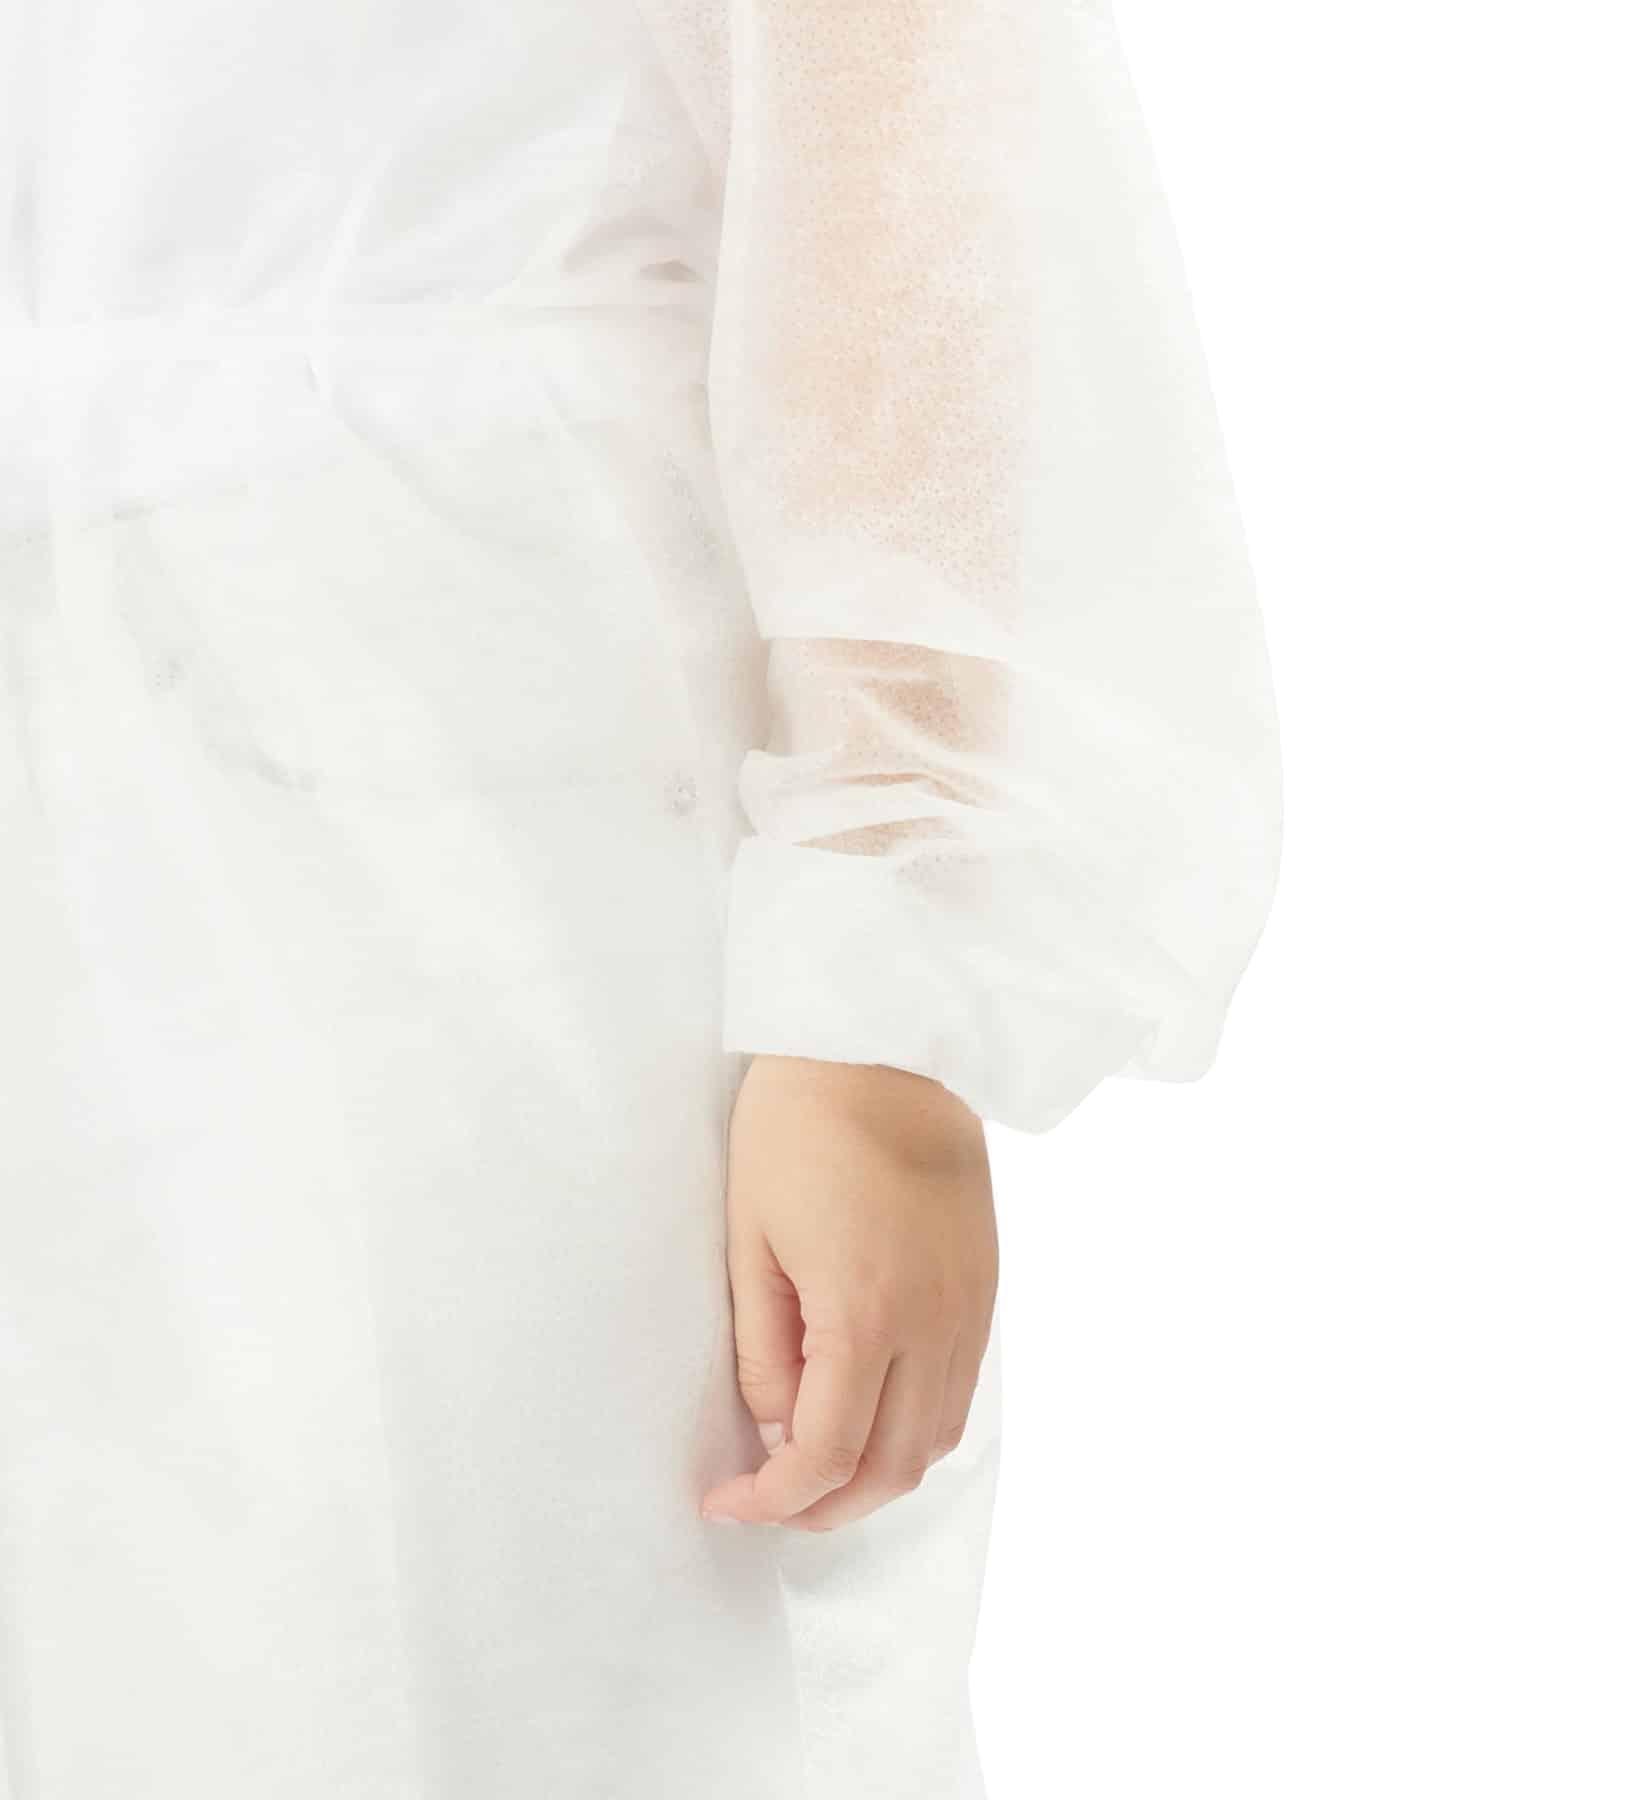 batas hidrófugas 25g 8 - 25g water repellent gowns - clothe protect